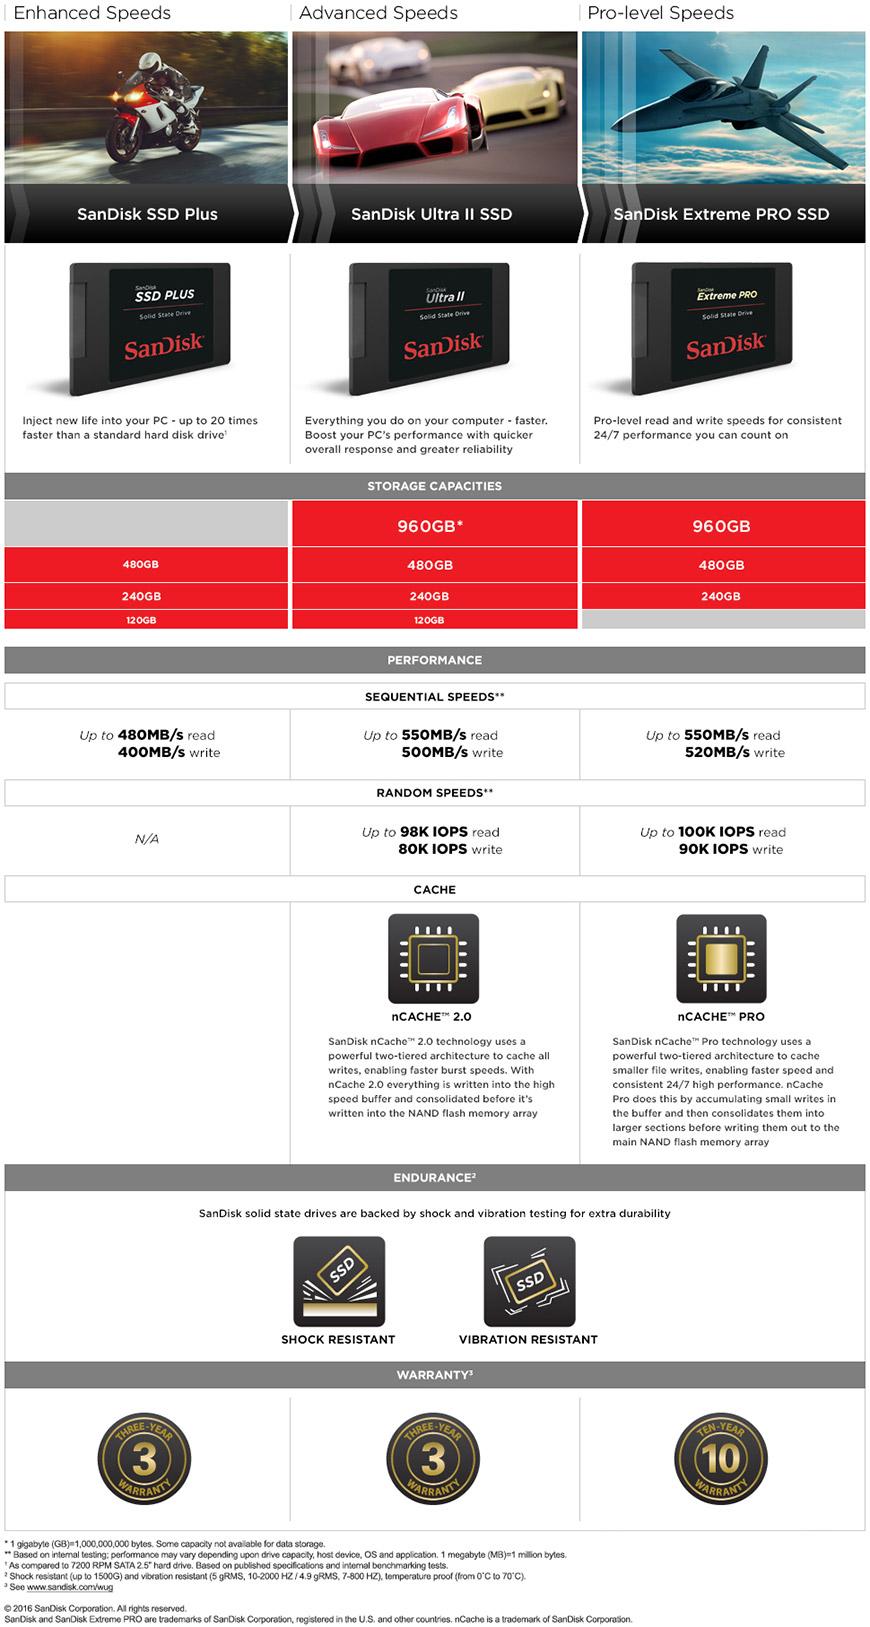 SanDisk Ultra® II SSD 480GB